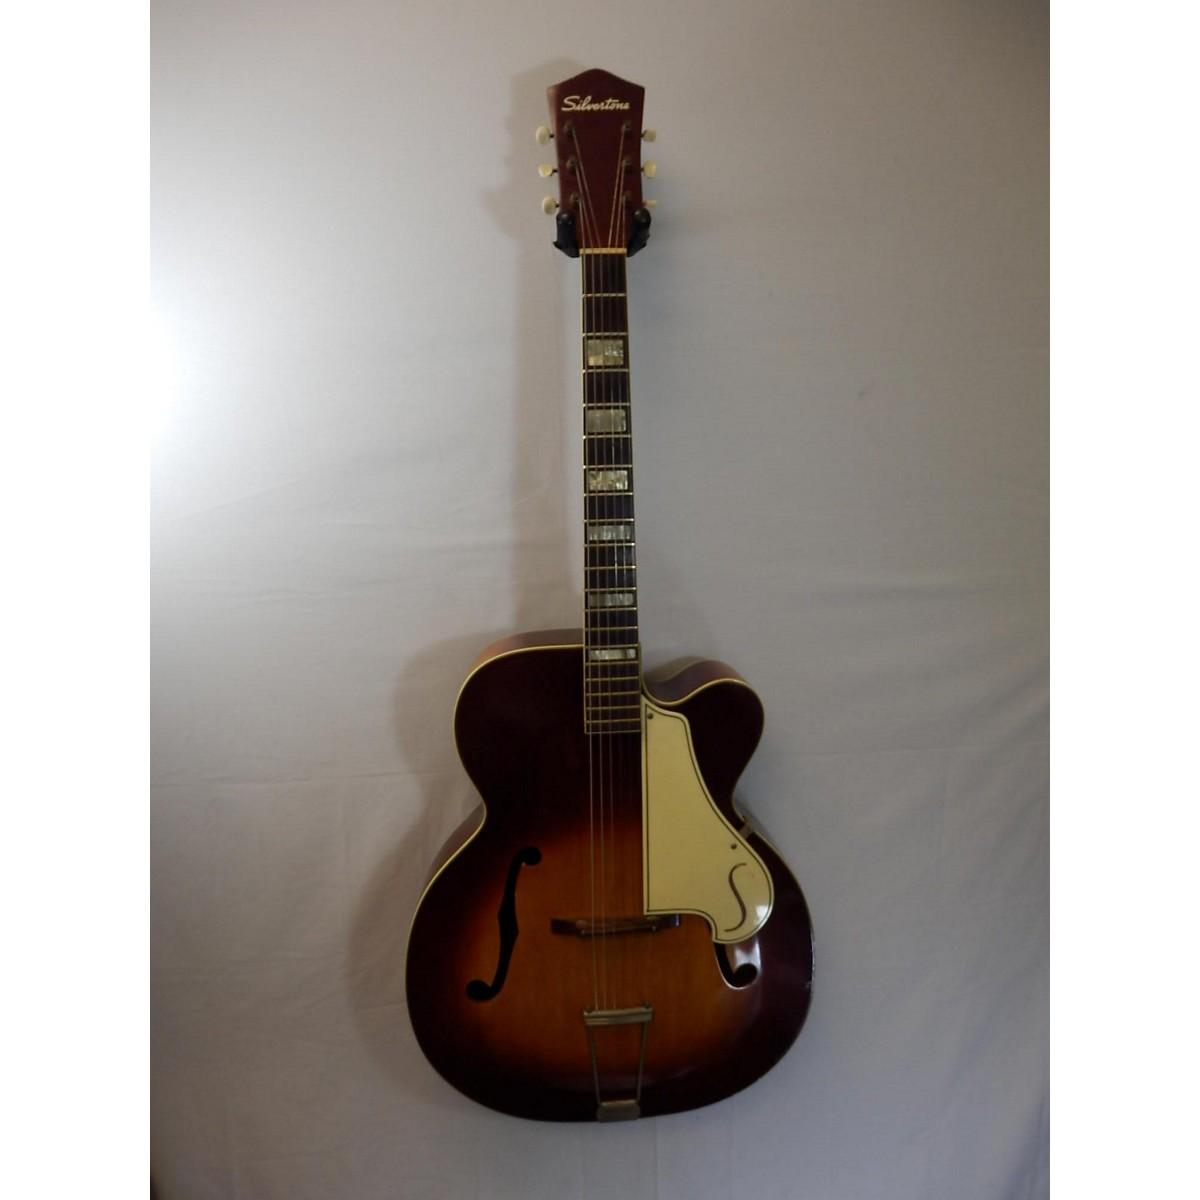 Silvertone 1960s Aristocrat Arch Top Acoustic Guitar